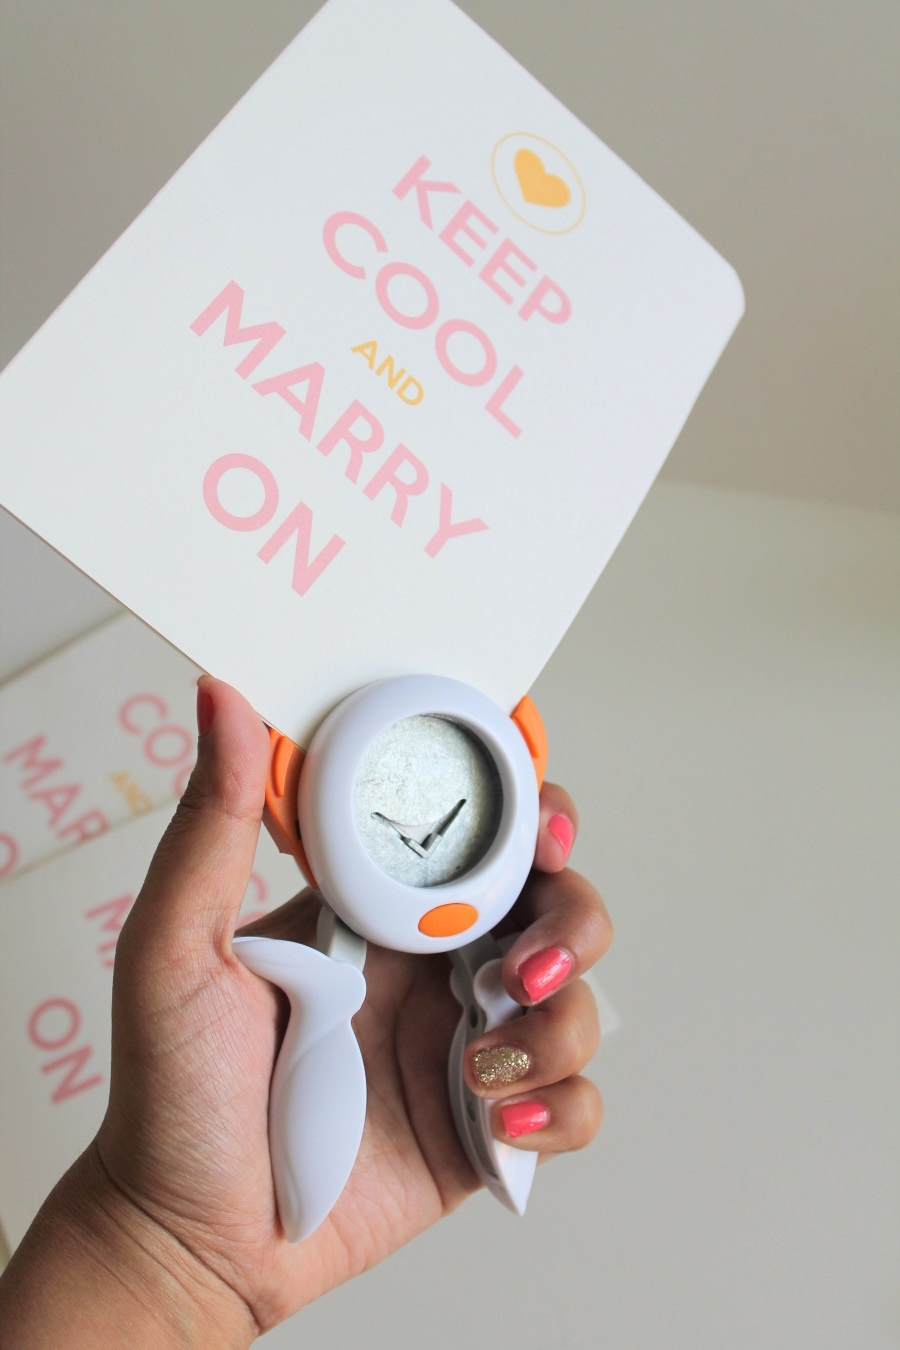 Diy Wedding Paddle Fans + Free Printable - United With Love - Free Printable Wedding Fan Templates